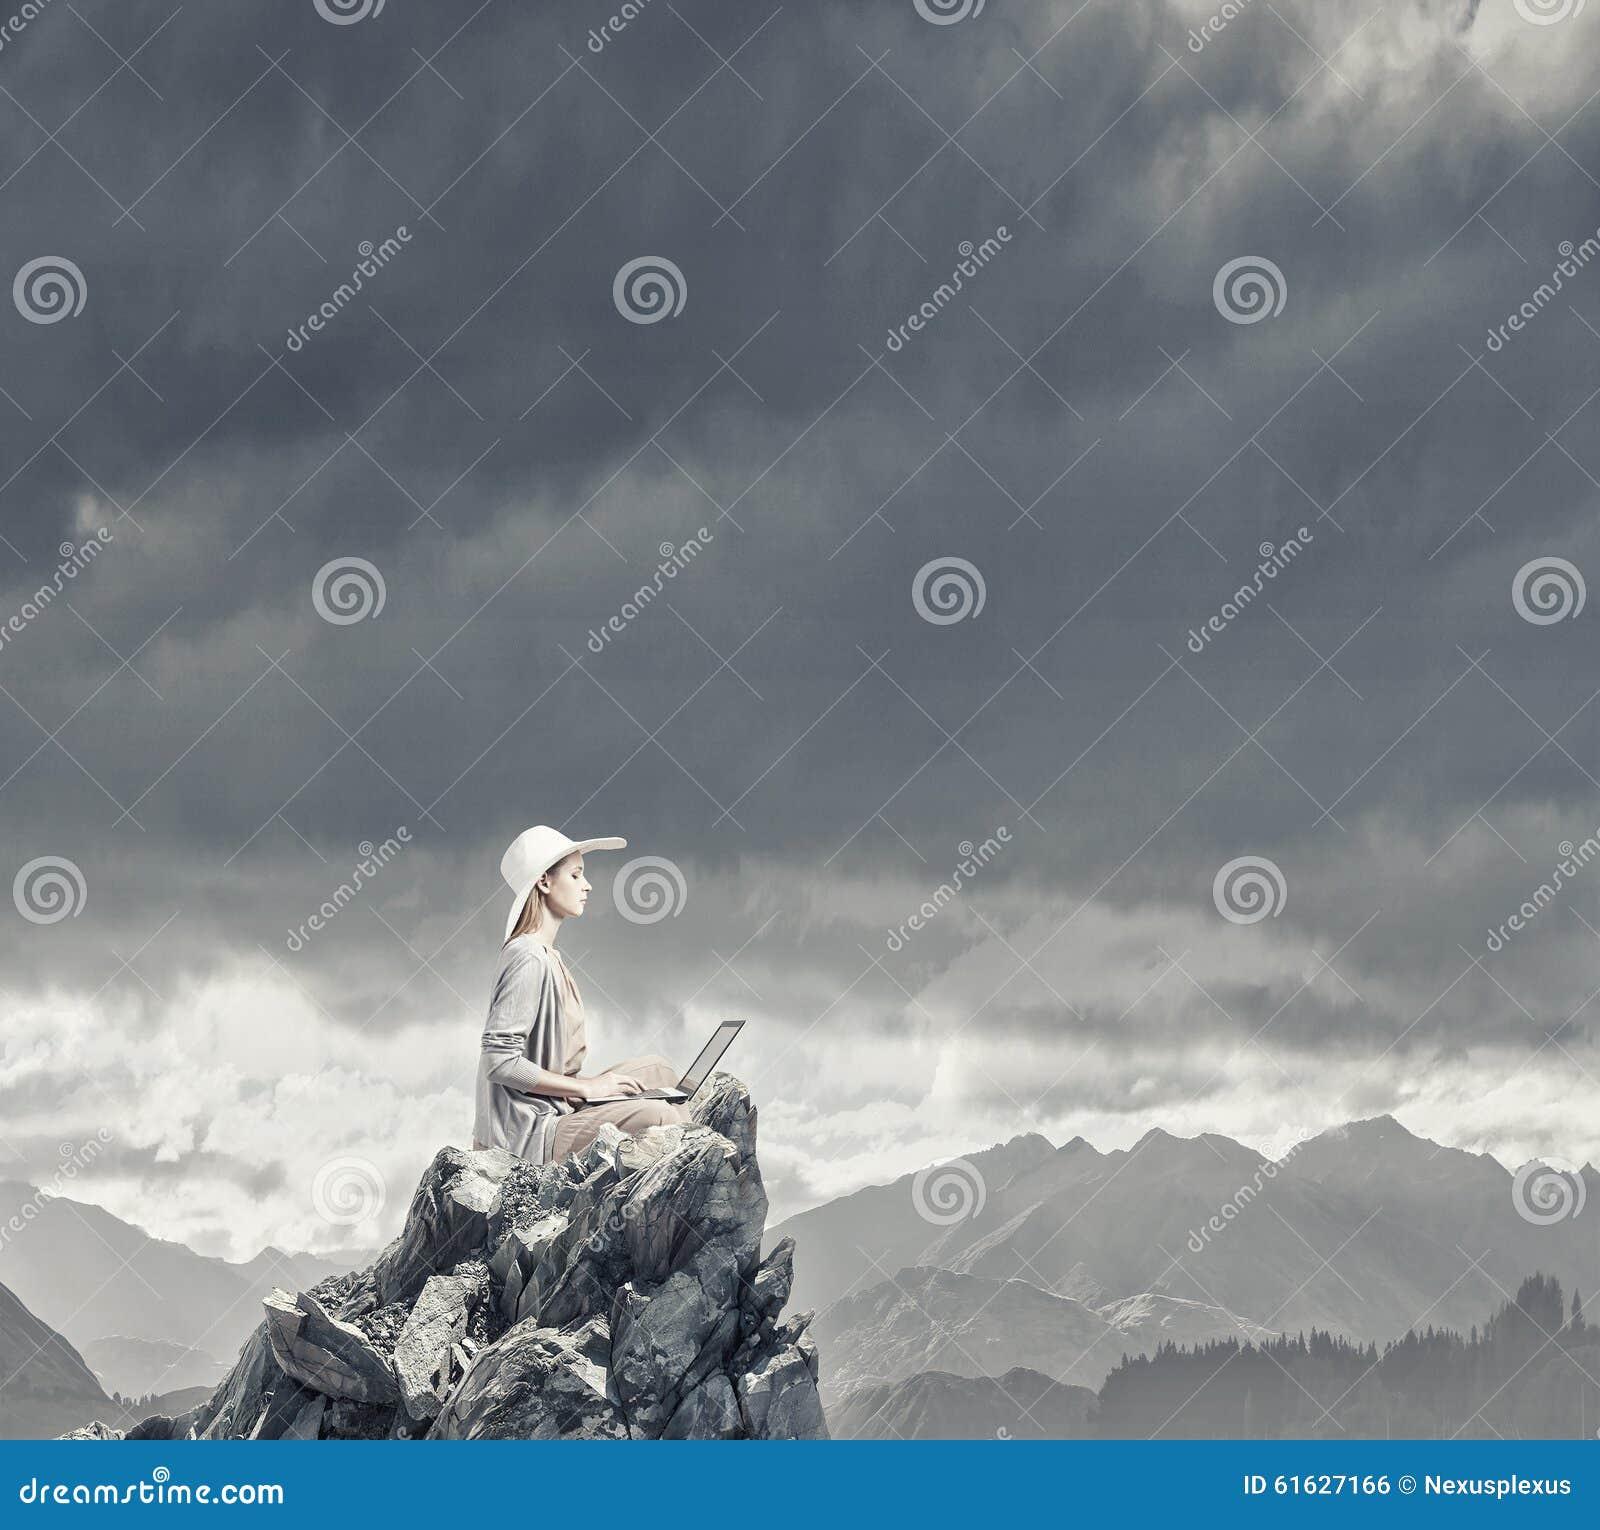 Remote Work. Concept Image Stock Photo - Image: 61627166